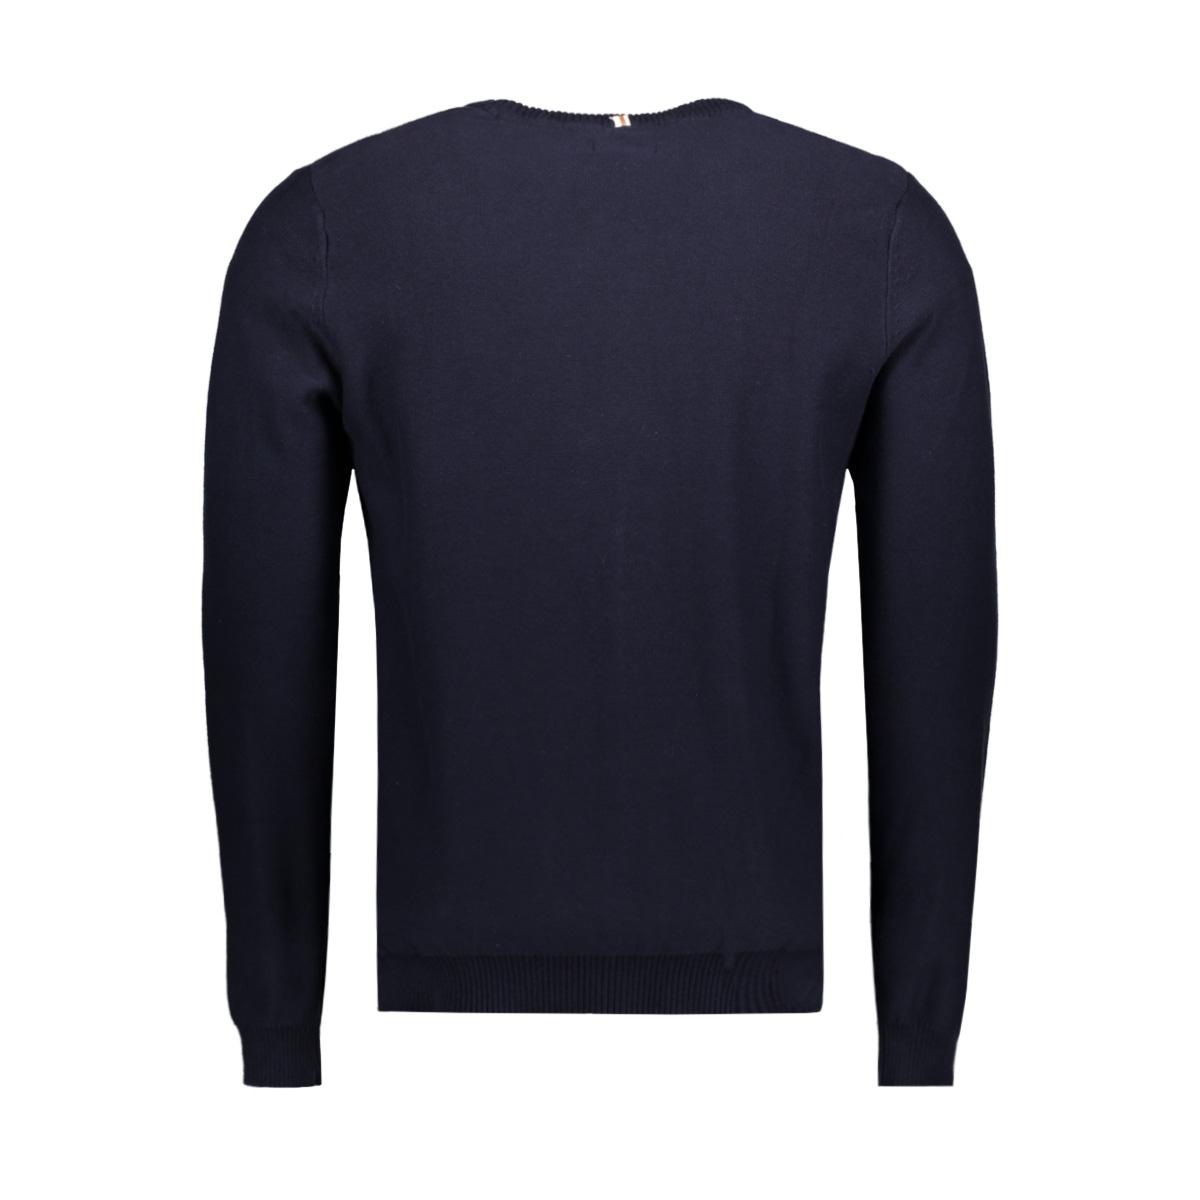 3022961.00.10 tom tailor sweater 6800